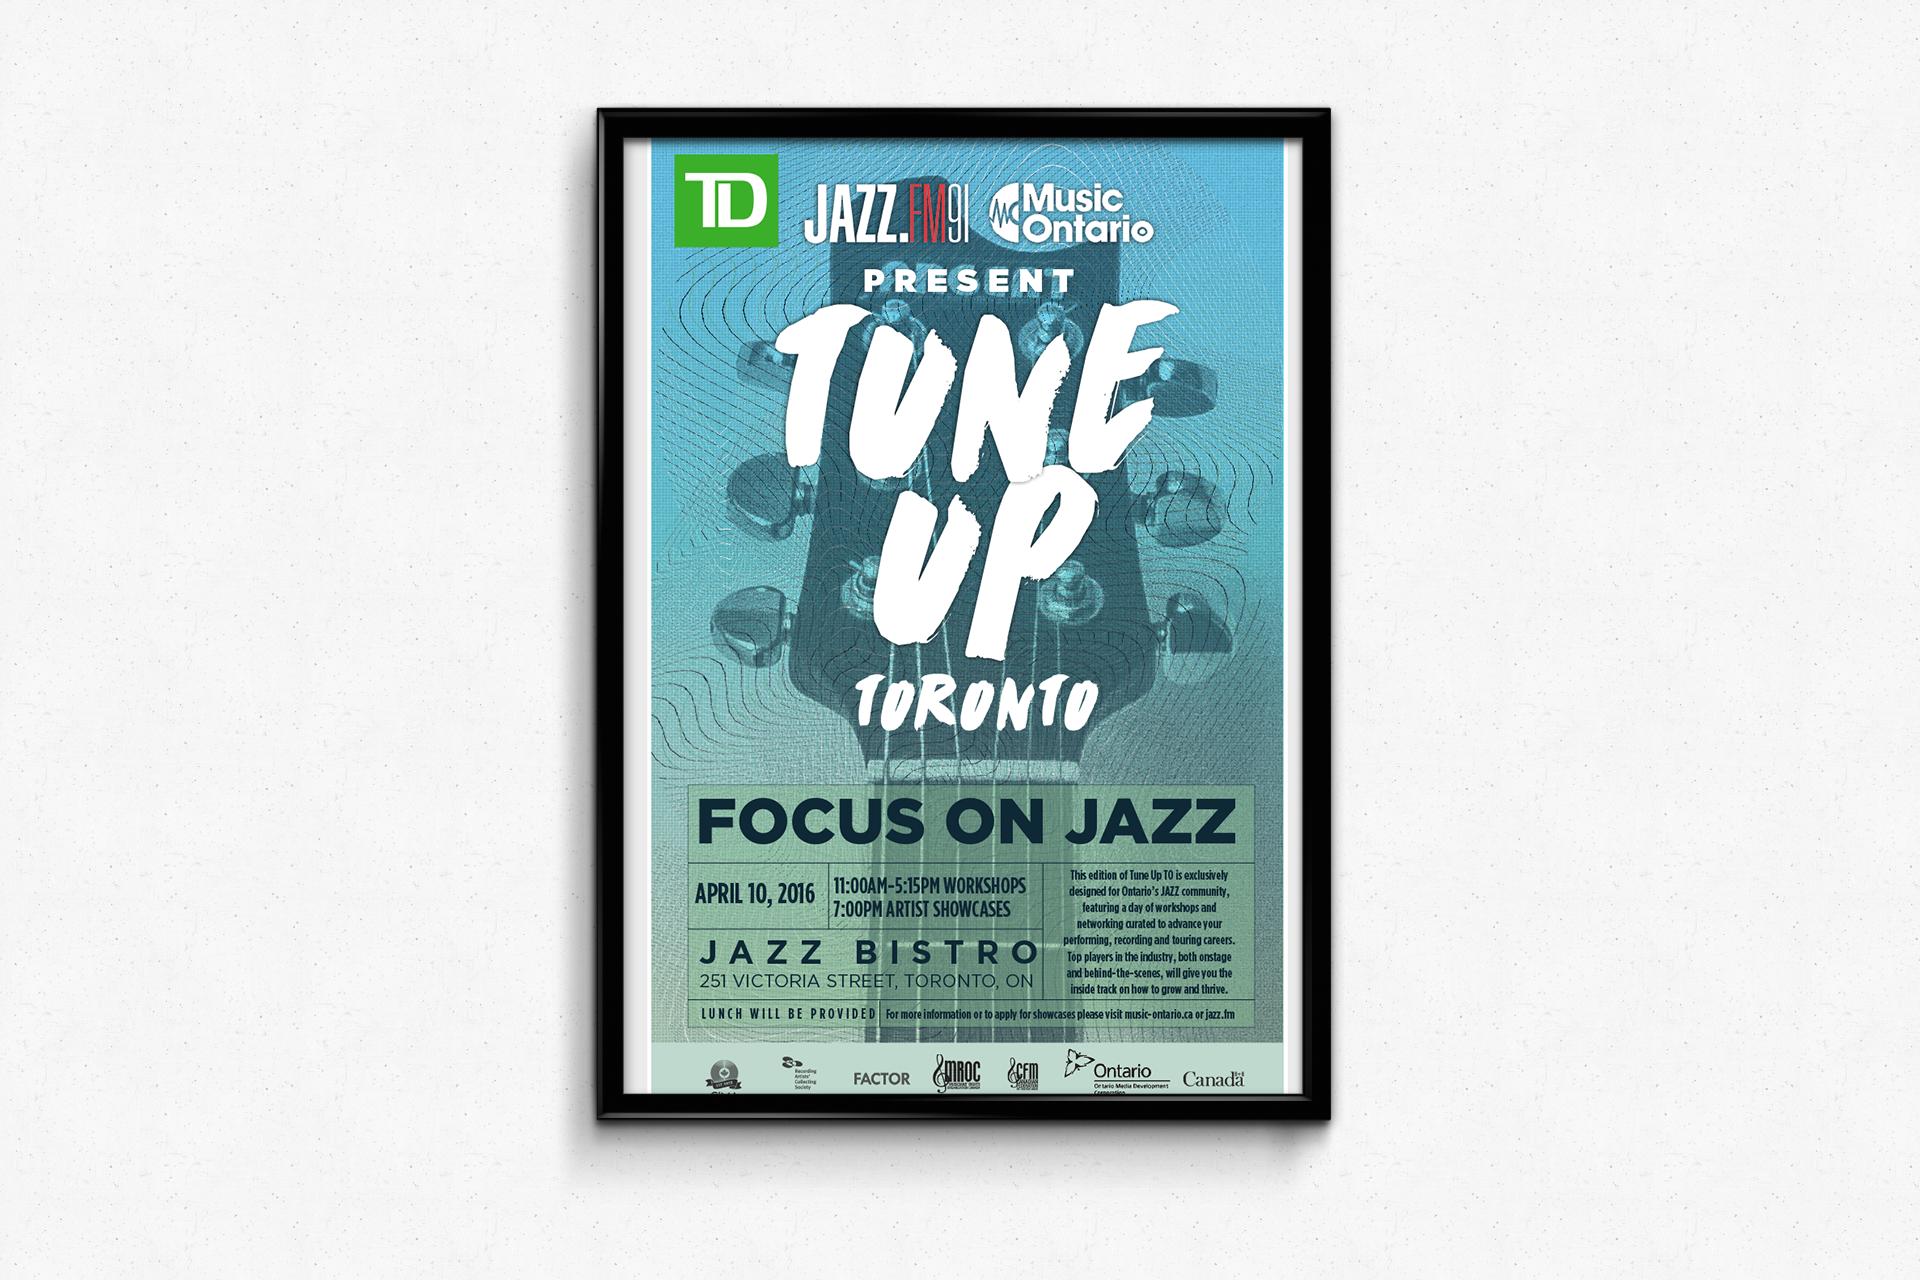 MusicOntario – Tune Up Toronto!